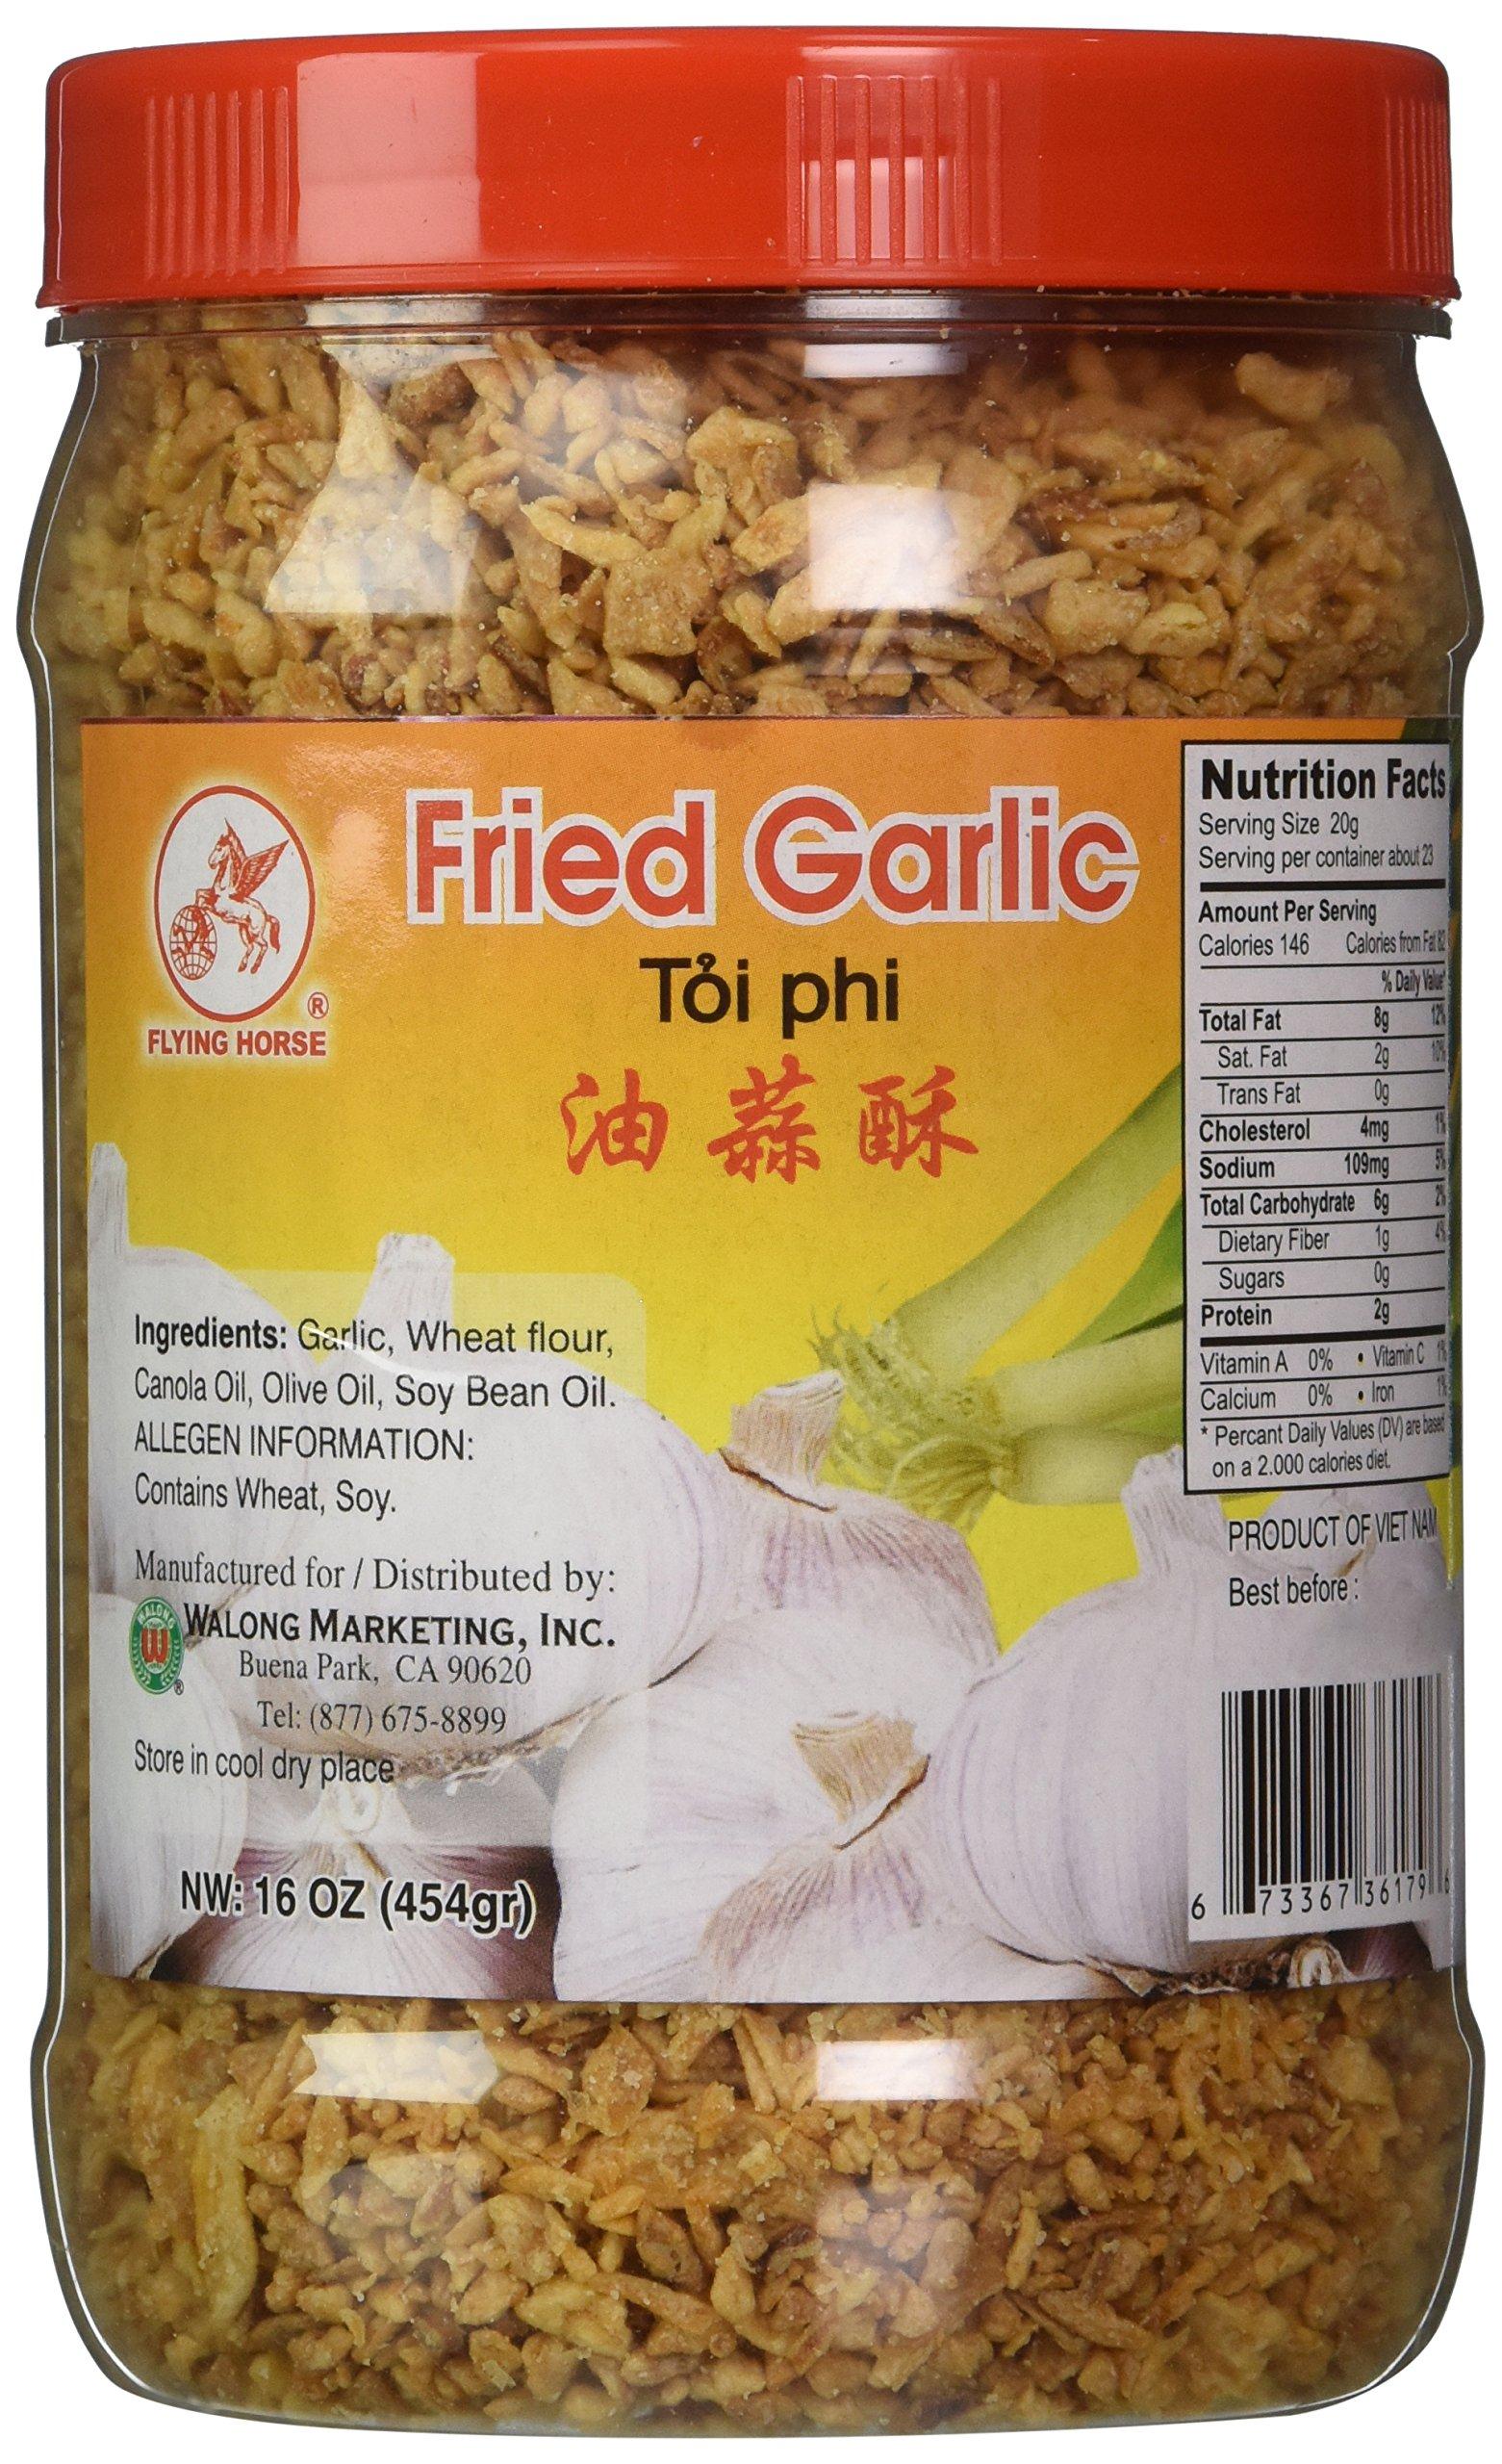 16oz Flying Horse Crispy Fried Garlic (1 Pound Total)